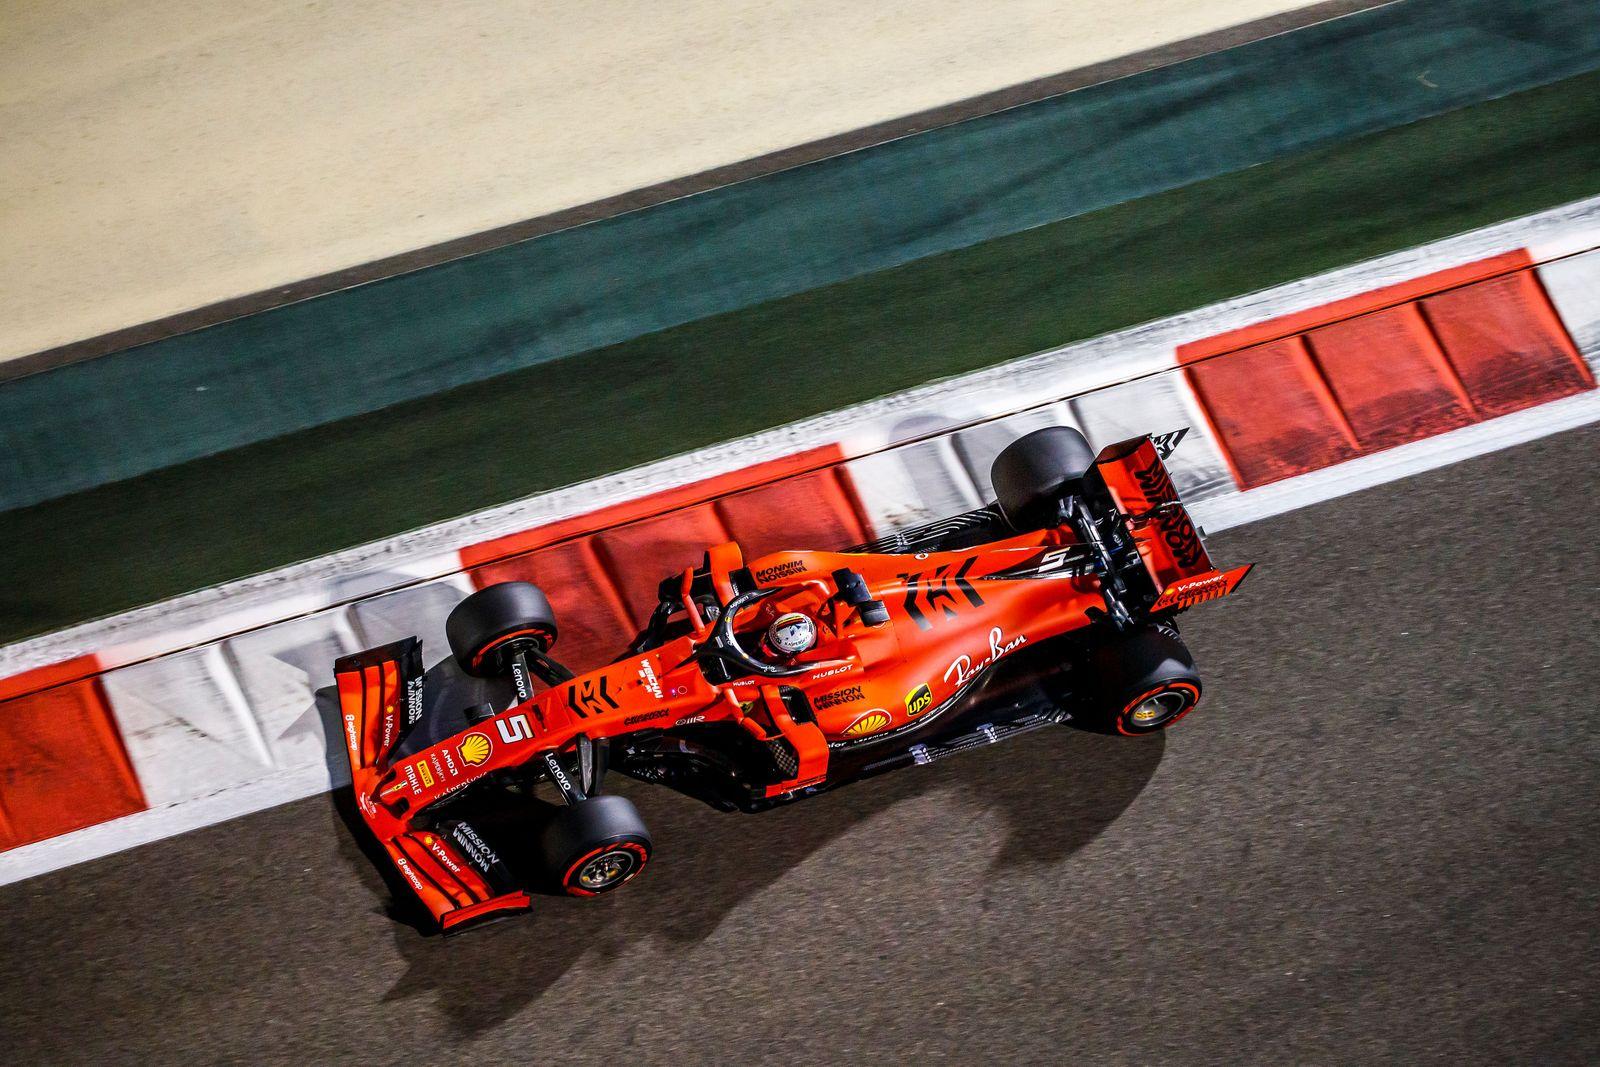 Formula One Grand Prix of Abu Dhabi, United Arab Emirates - 29 Nov 2019